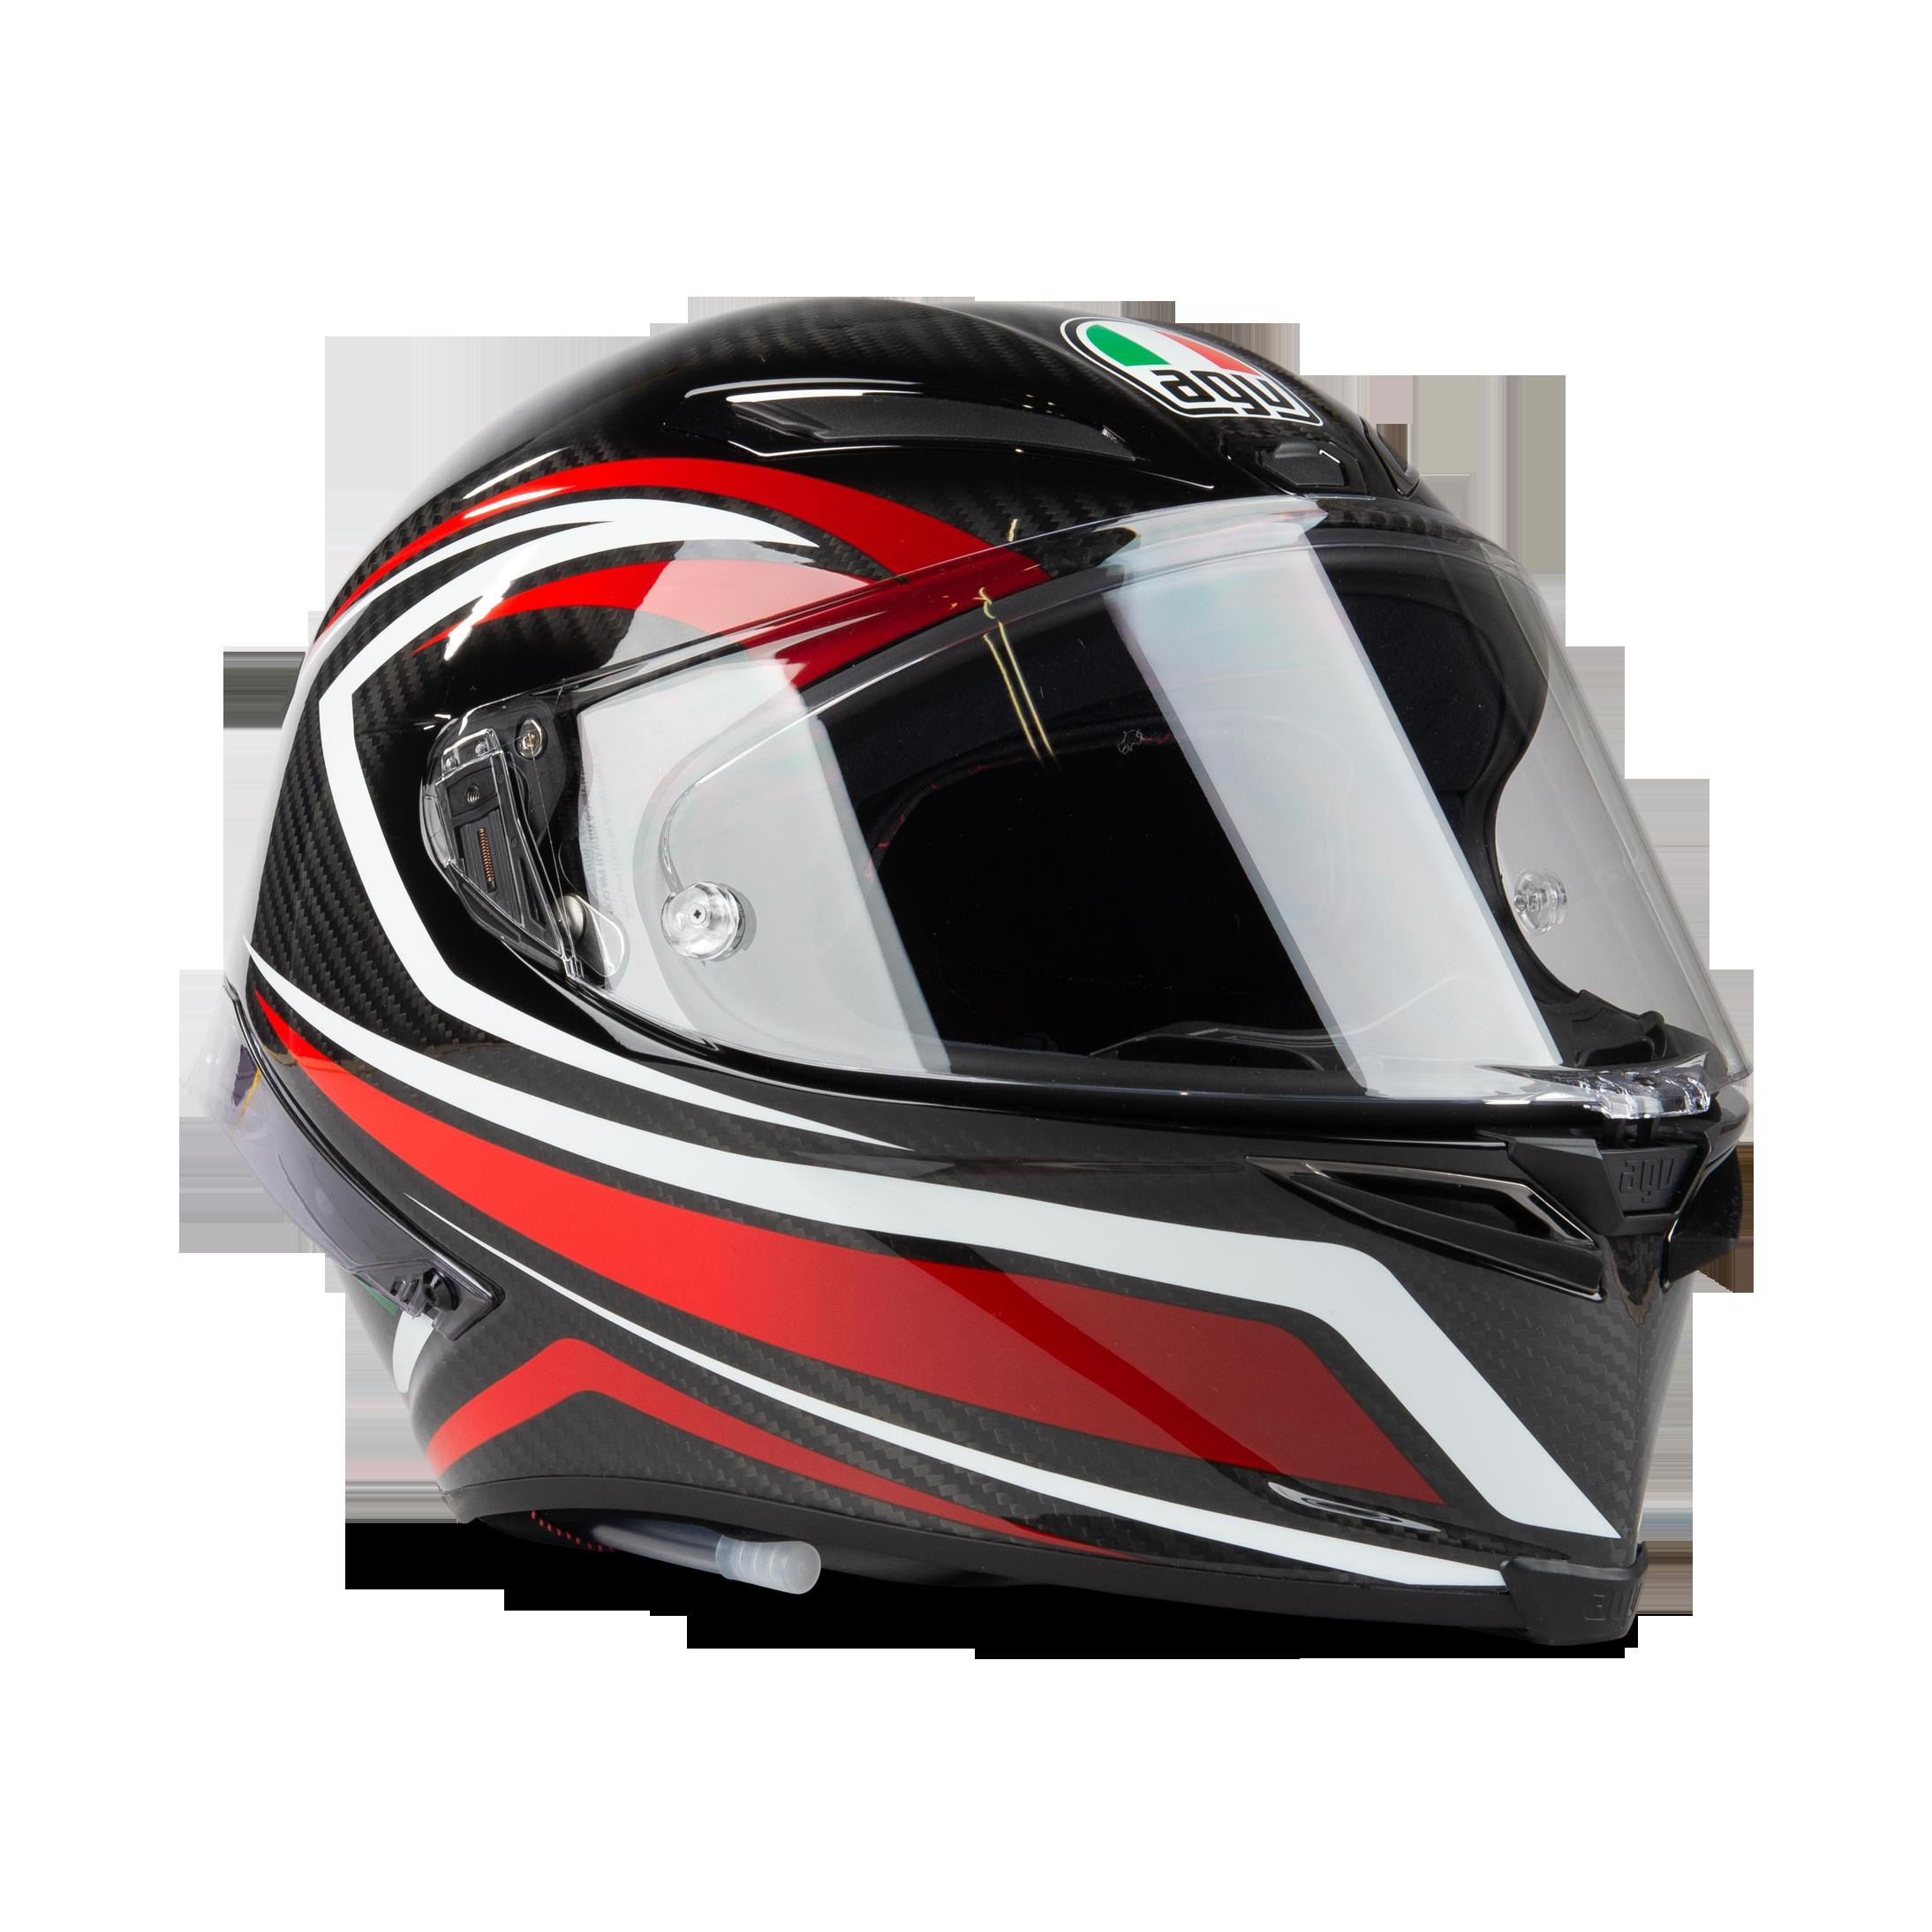 Agv Pista Gp R Mc Helmet Carbon Red Now 50 Savings Xlmoto Eu